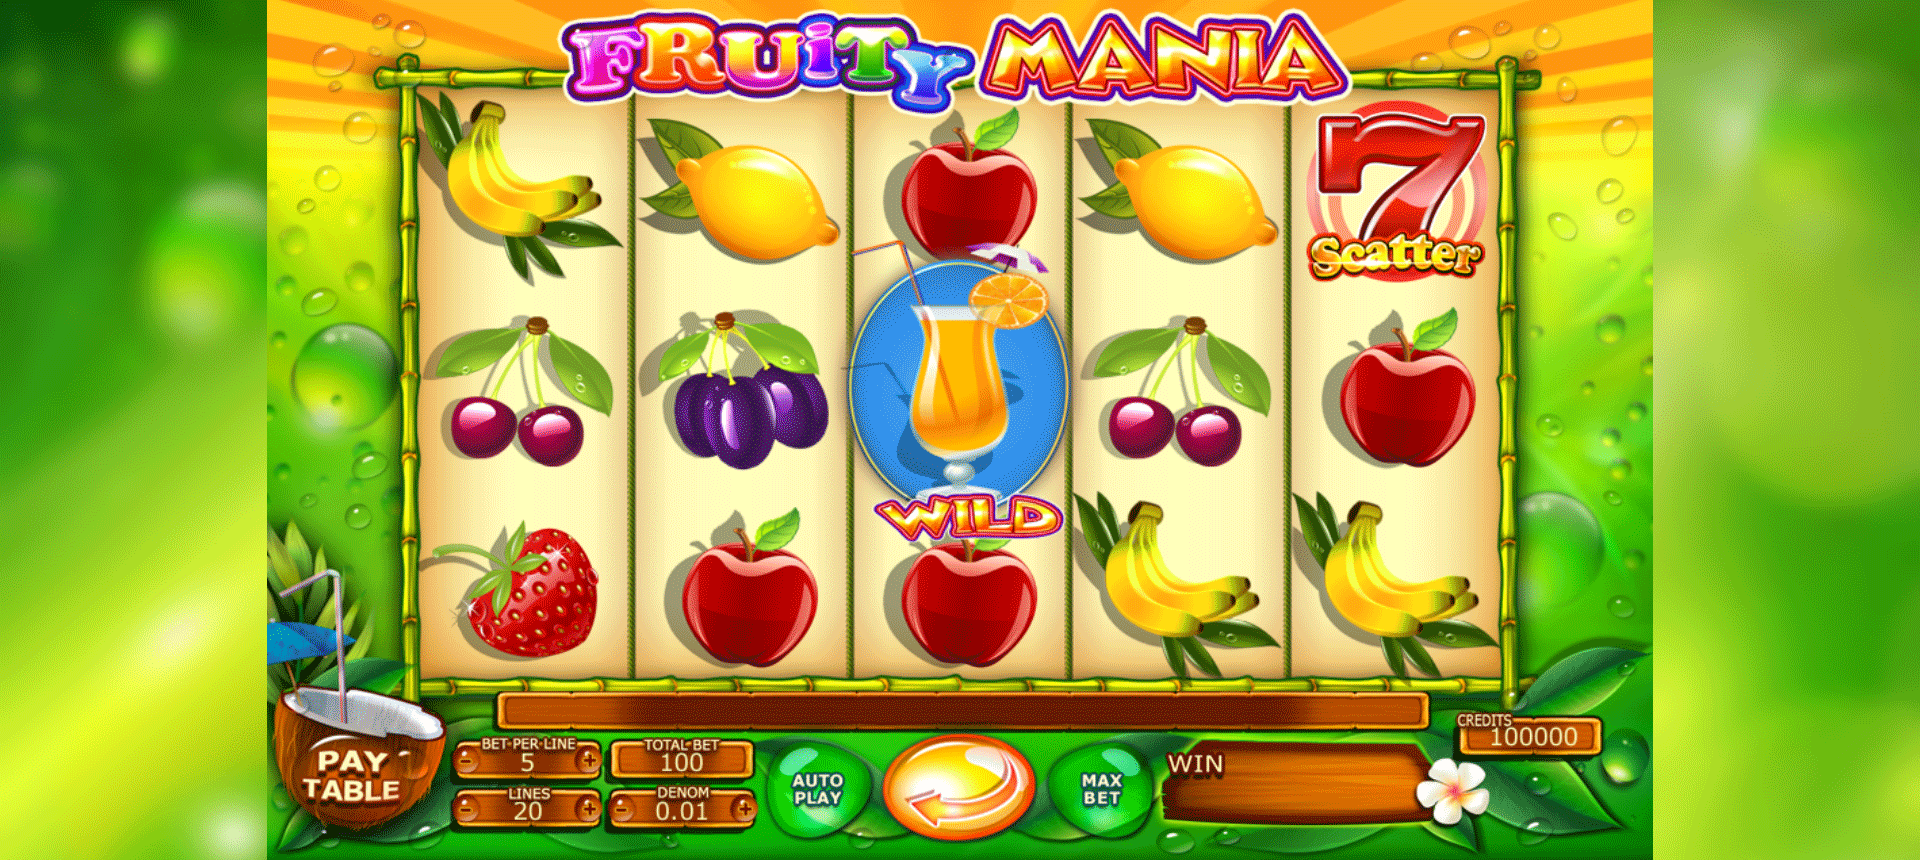 Slot Fruity Mania